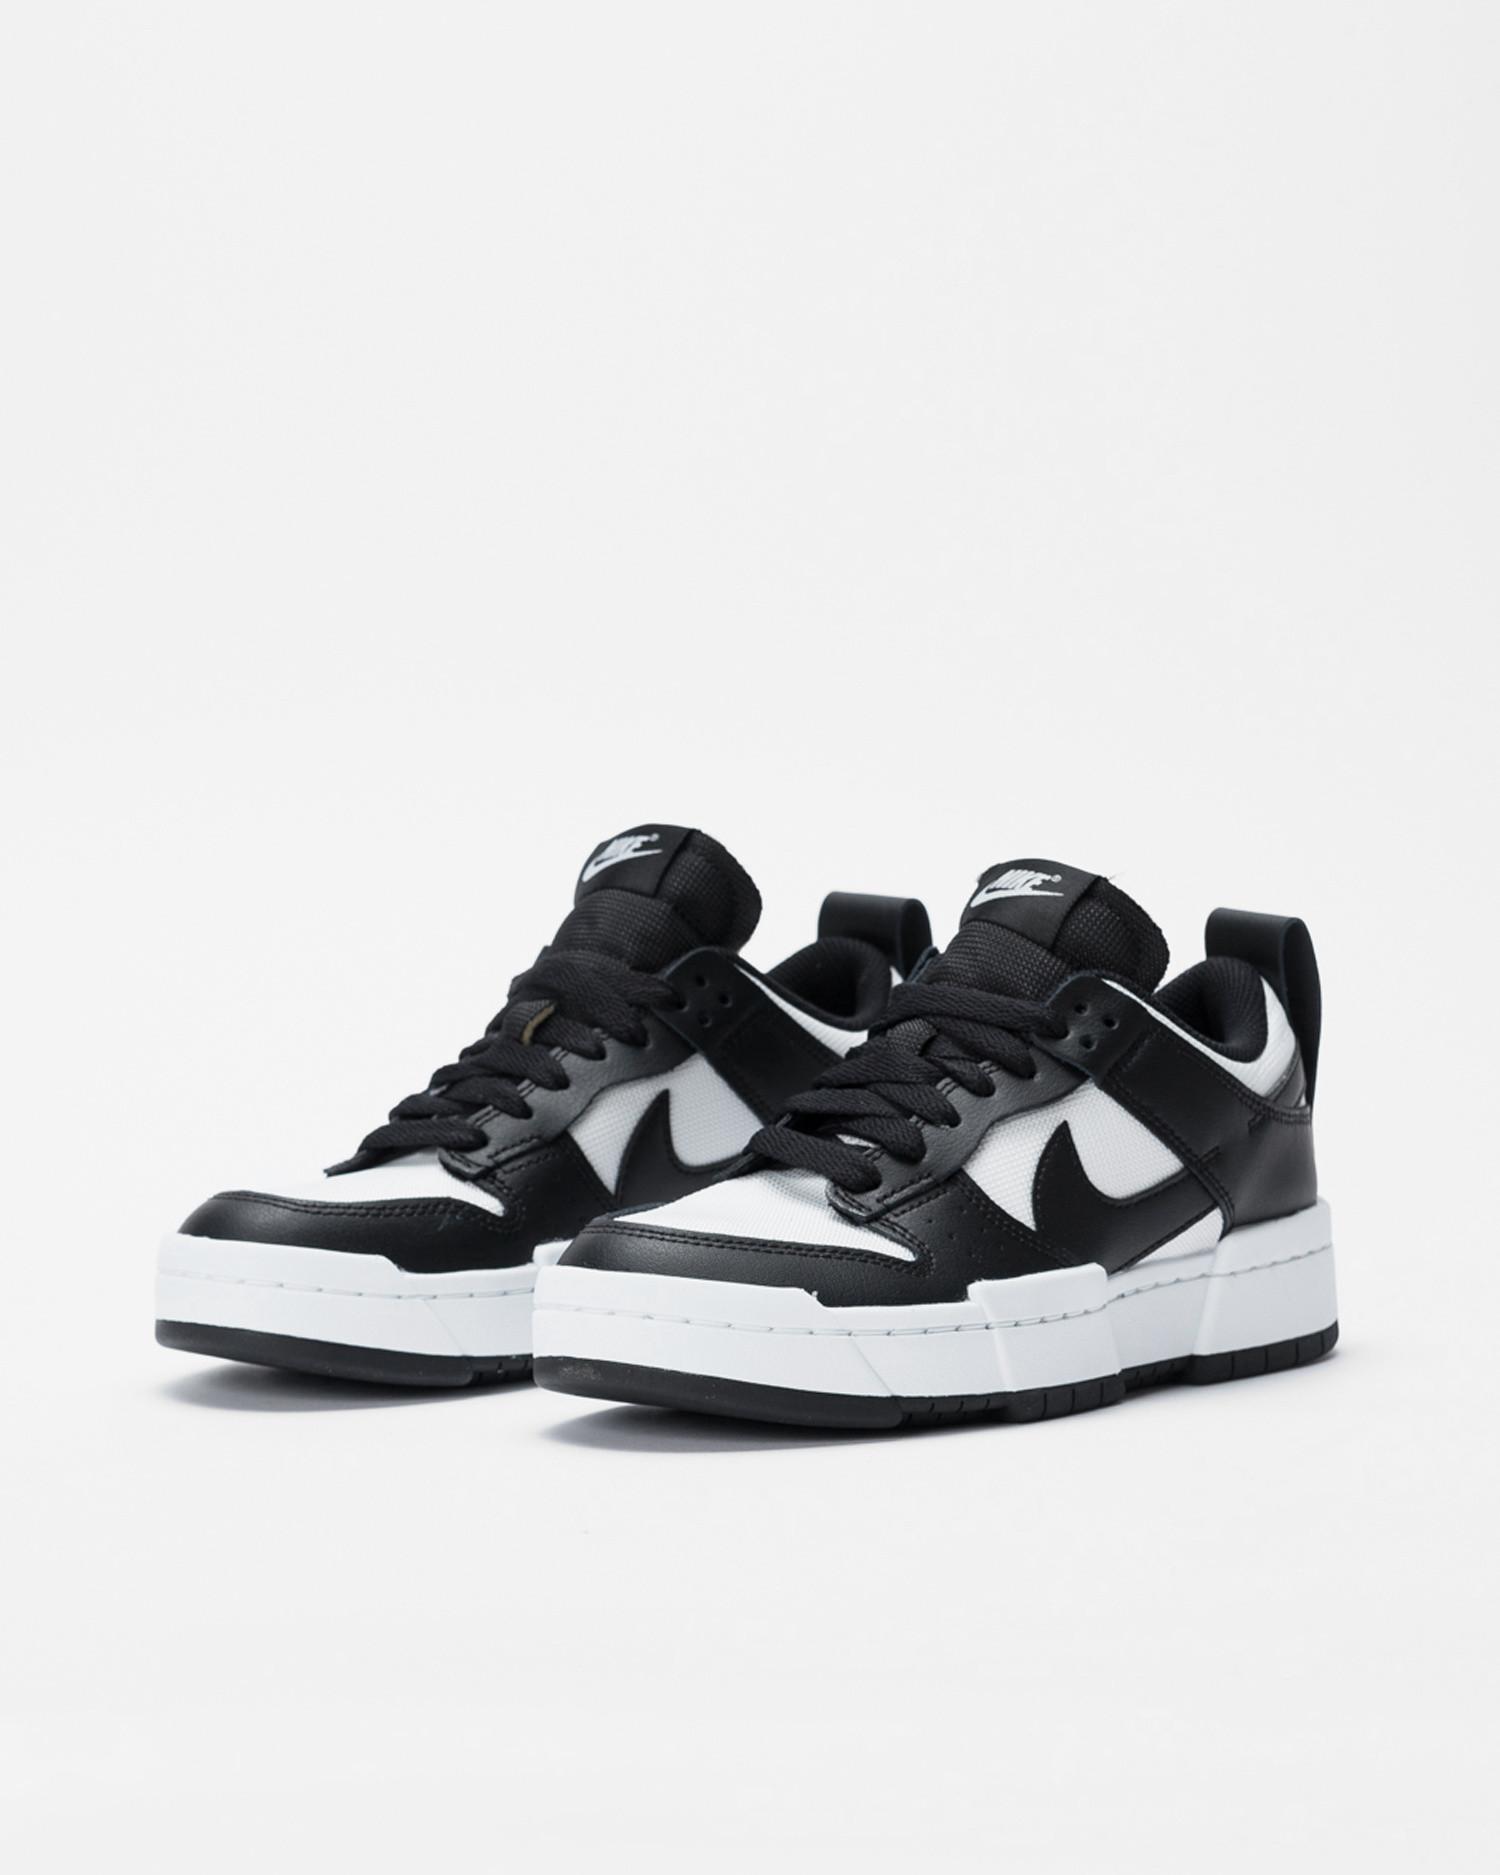 Nike Dunk Low Disrupt Summit white/black-summit white